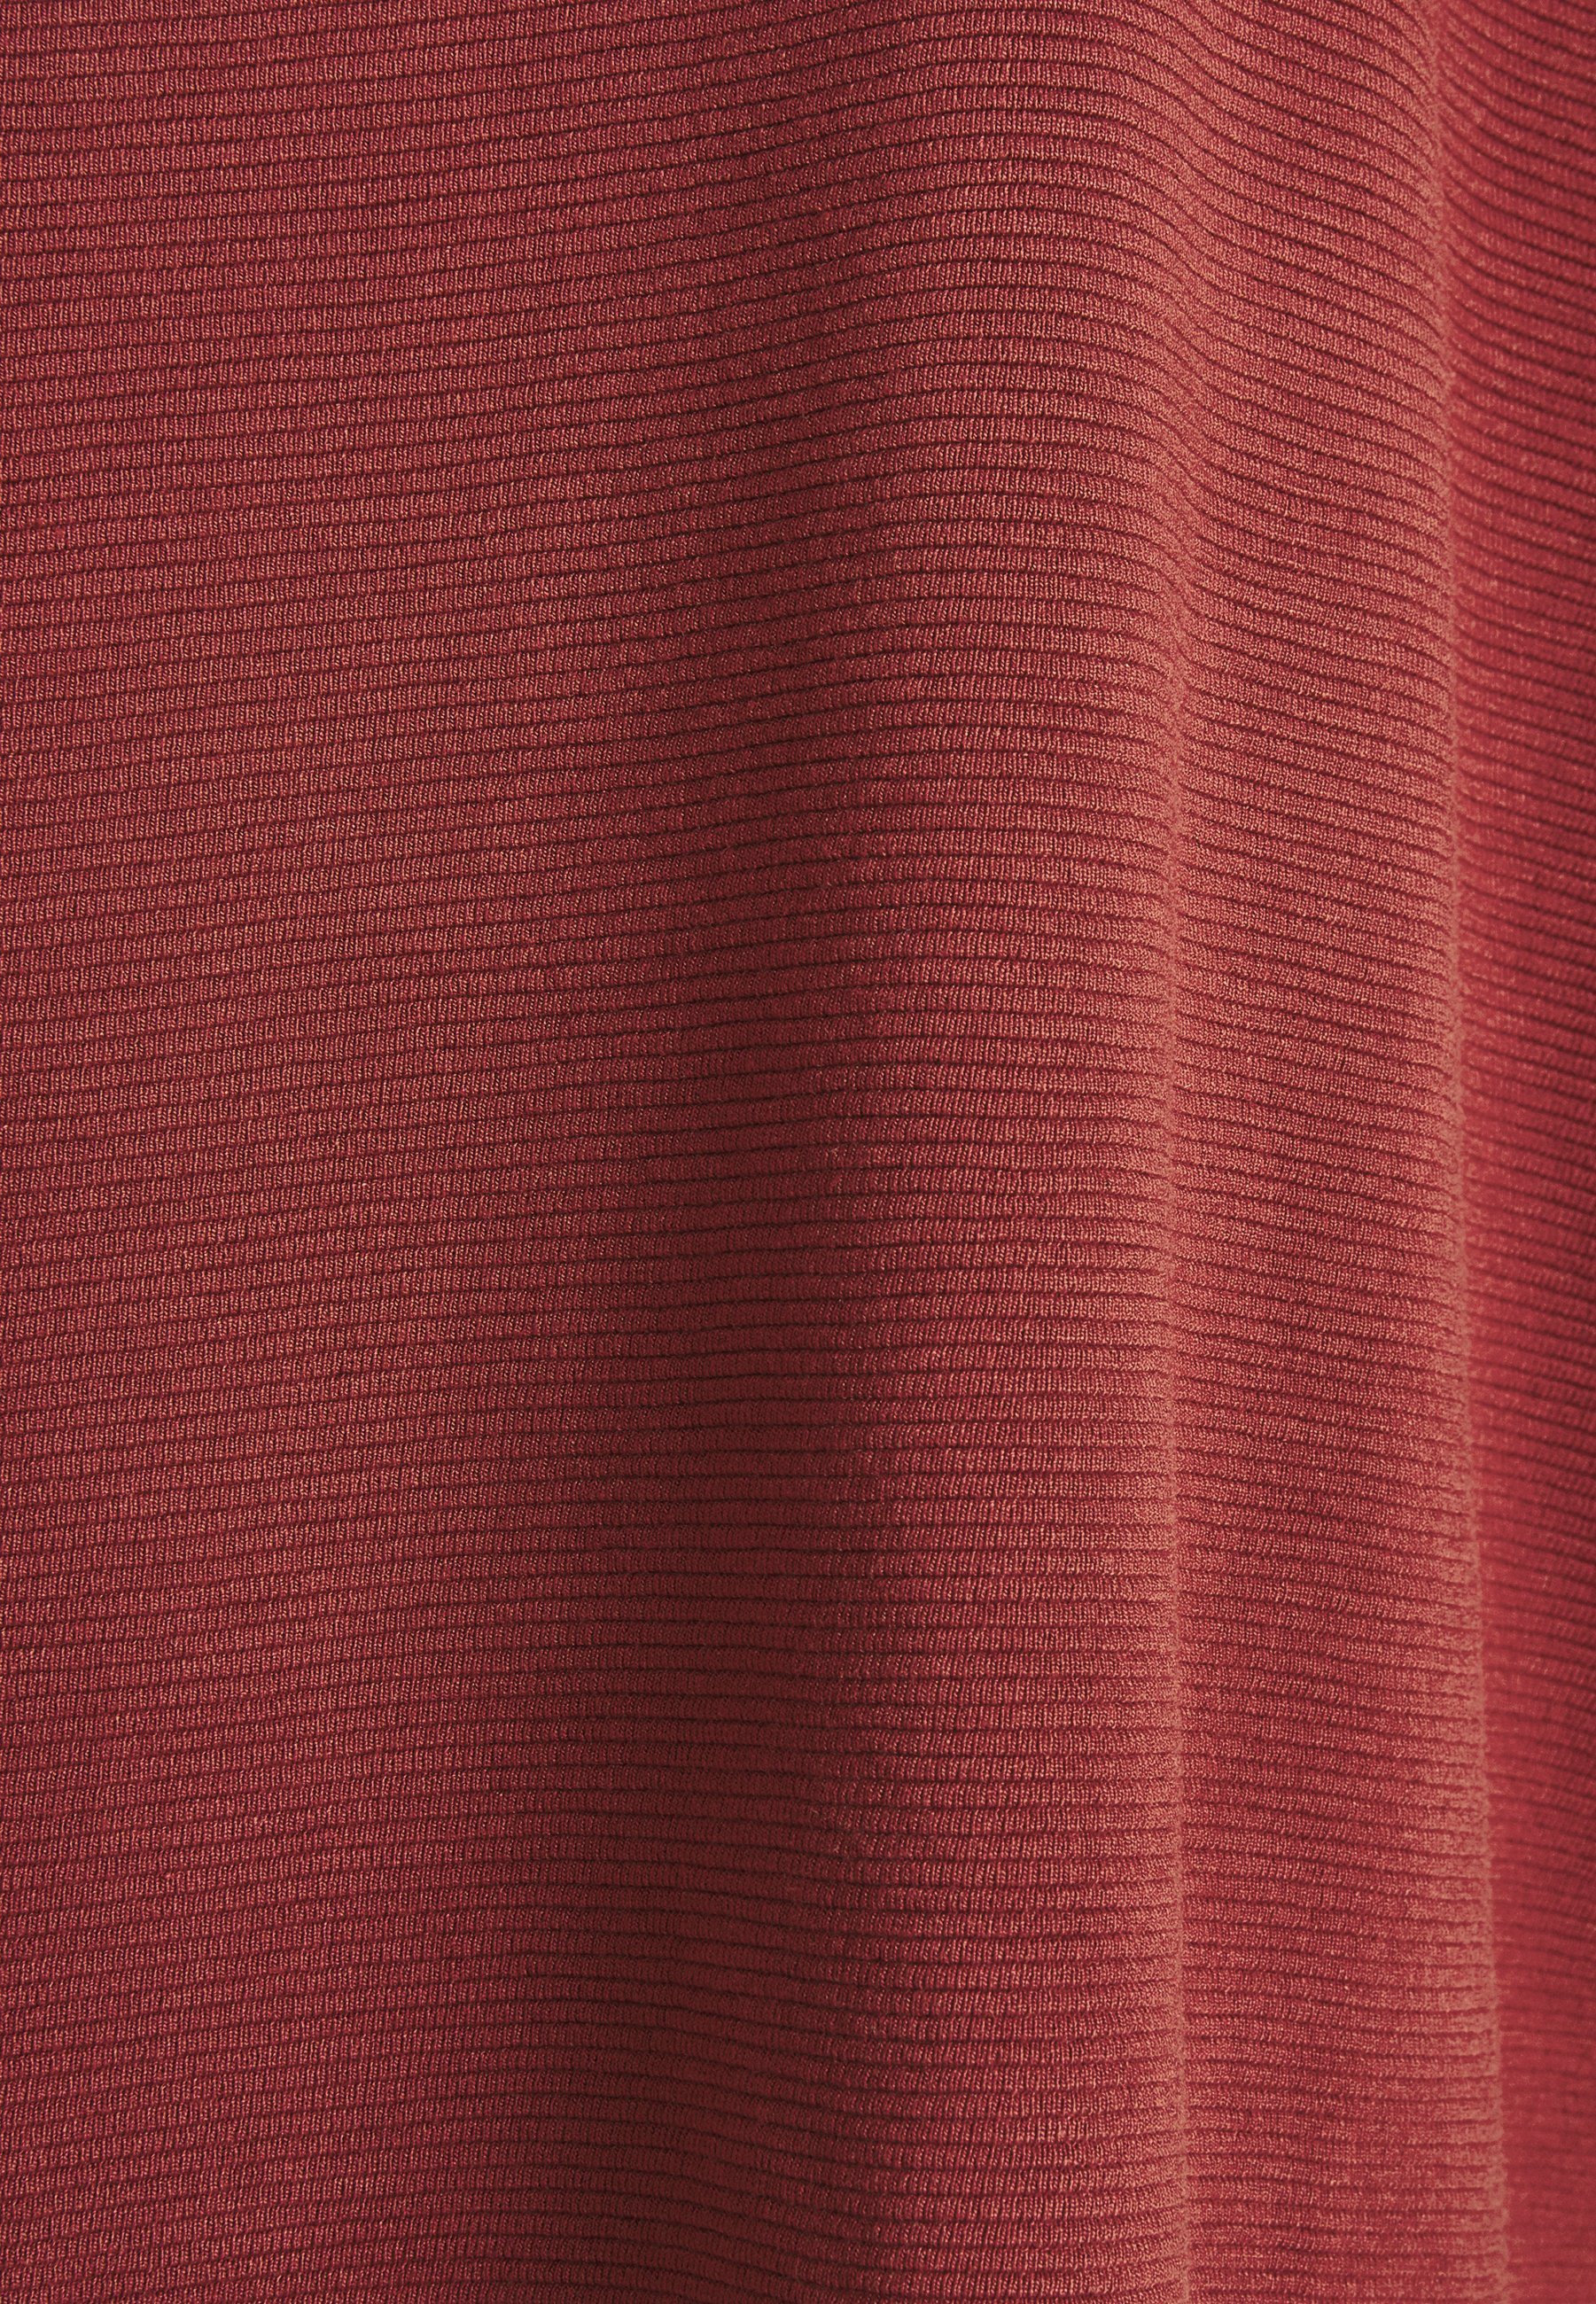 Tom Tailor Denim Structured Tee - Topper Langermet Rust Orange/lysebrun